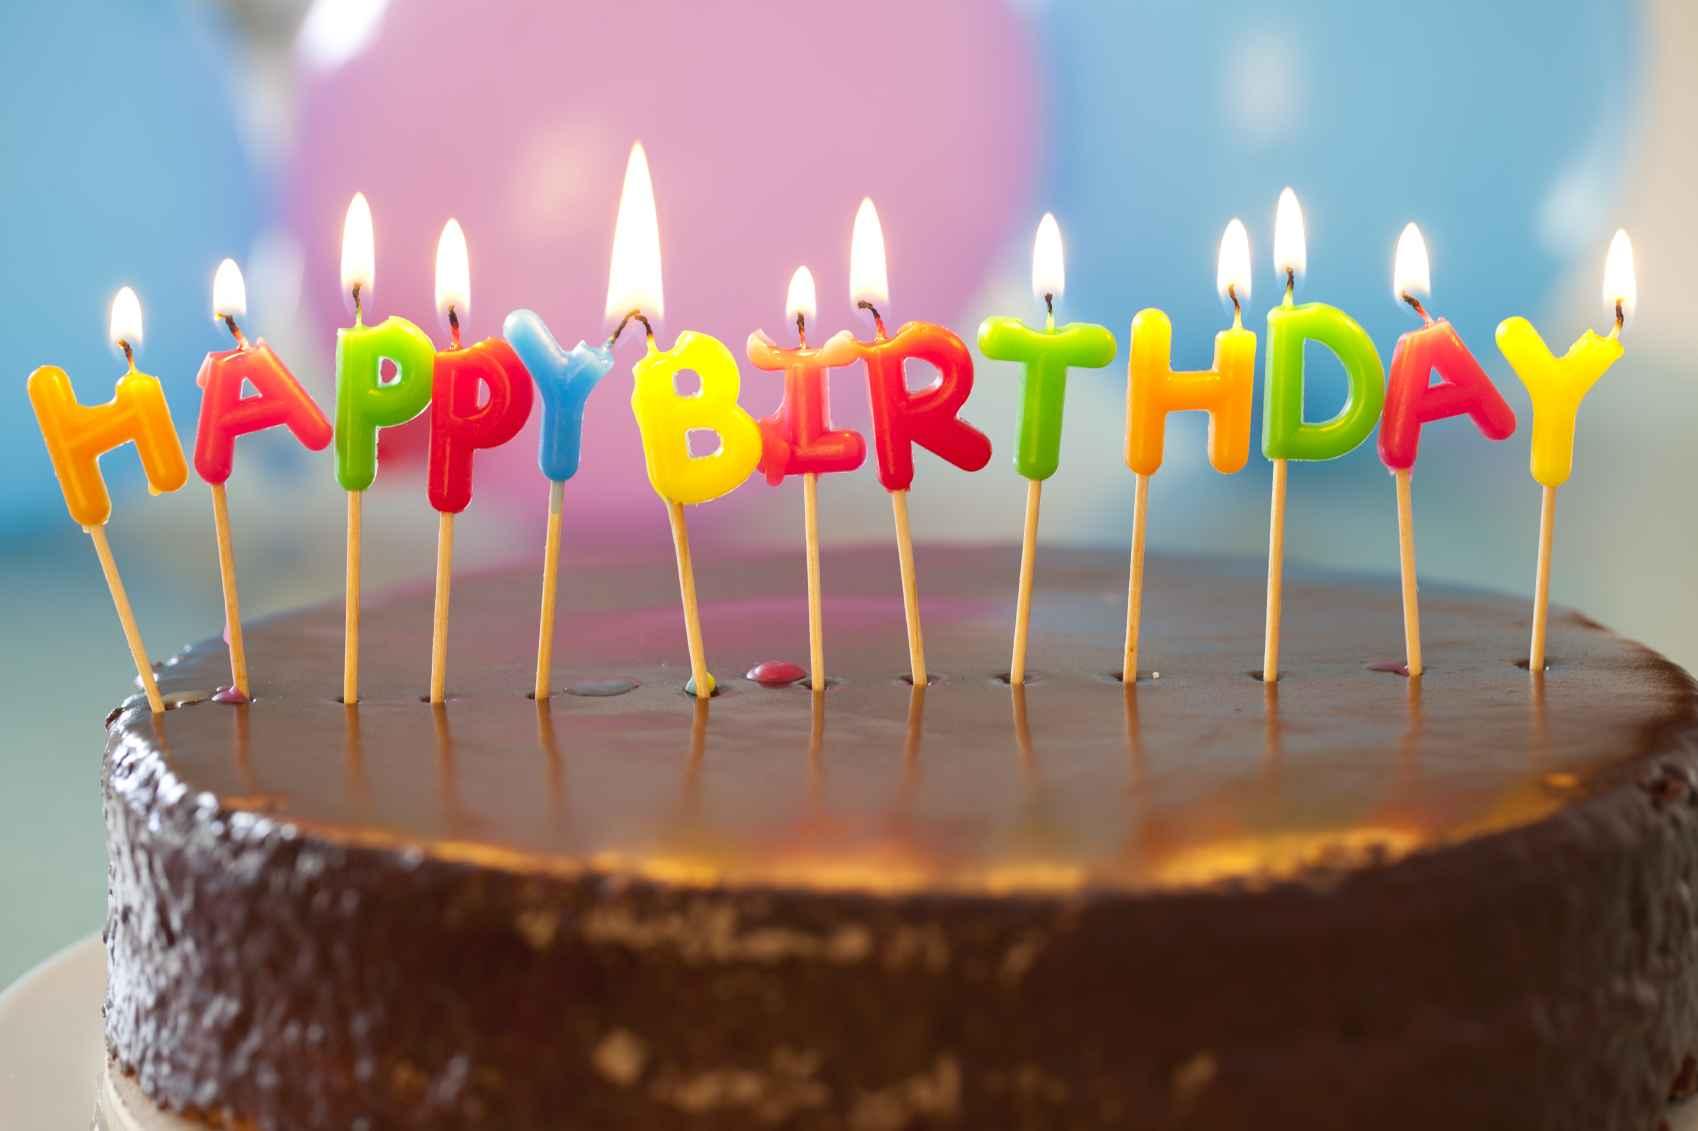 birthdaycake CLIFFORD GARSTANG